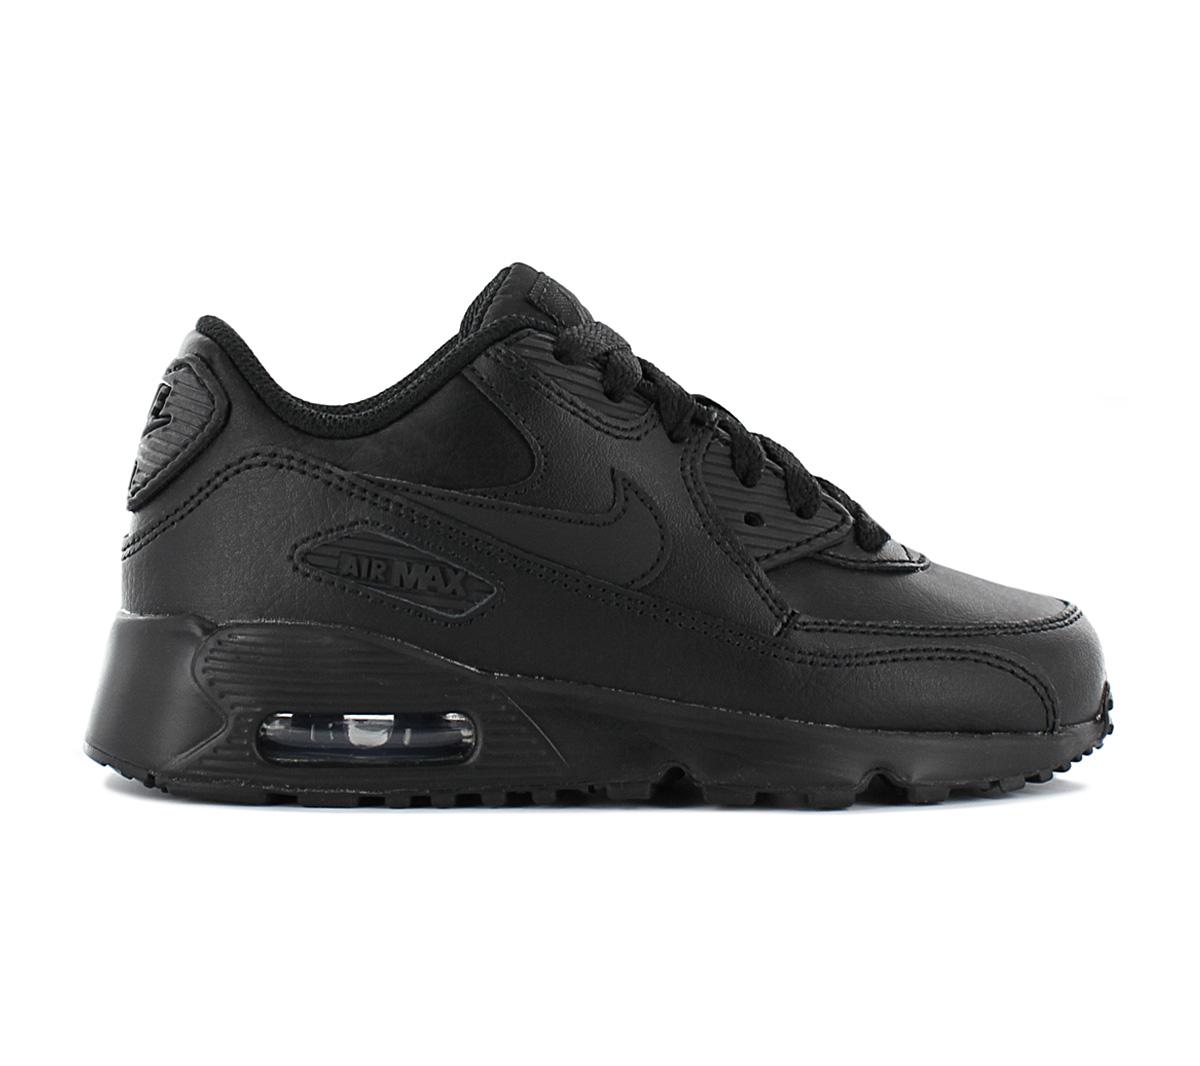 Details zu Nike Air Max 90 Leather (PS) Kinder Sneaker 833414 001 Leder Schwarz Schuhe NEU